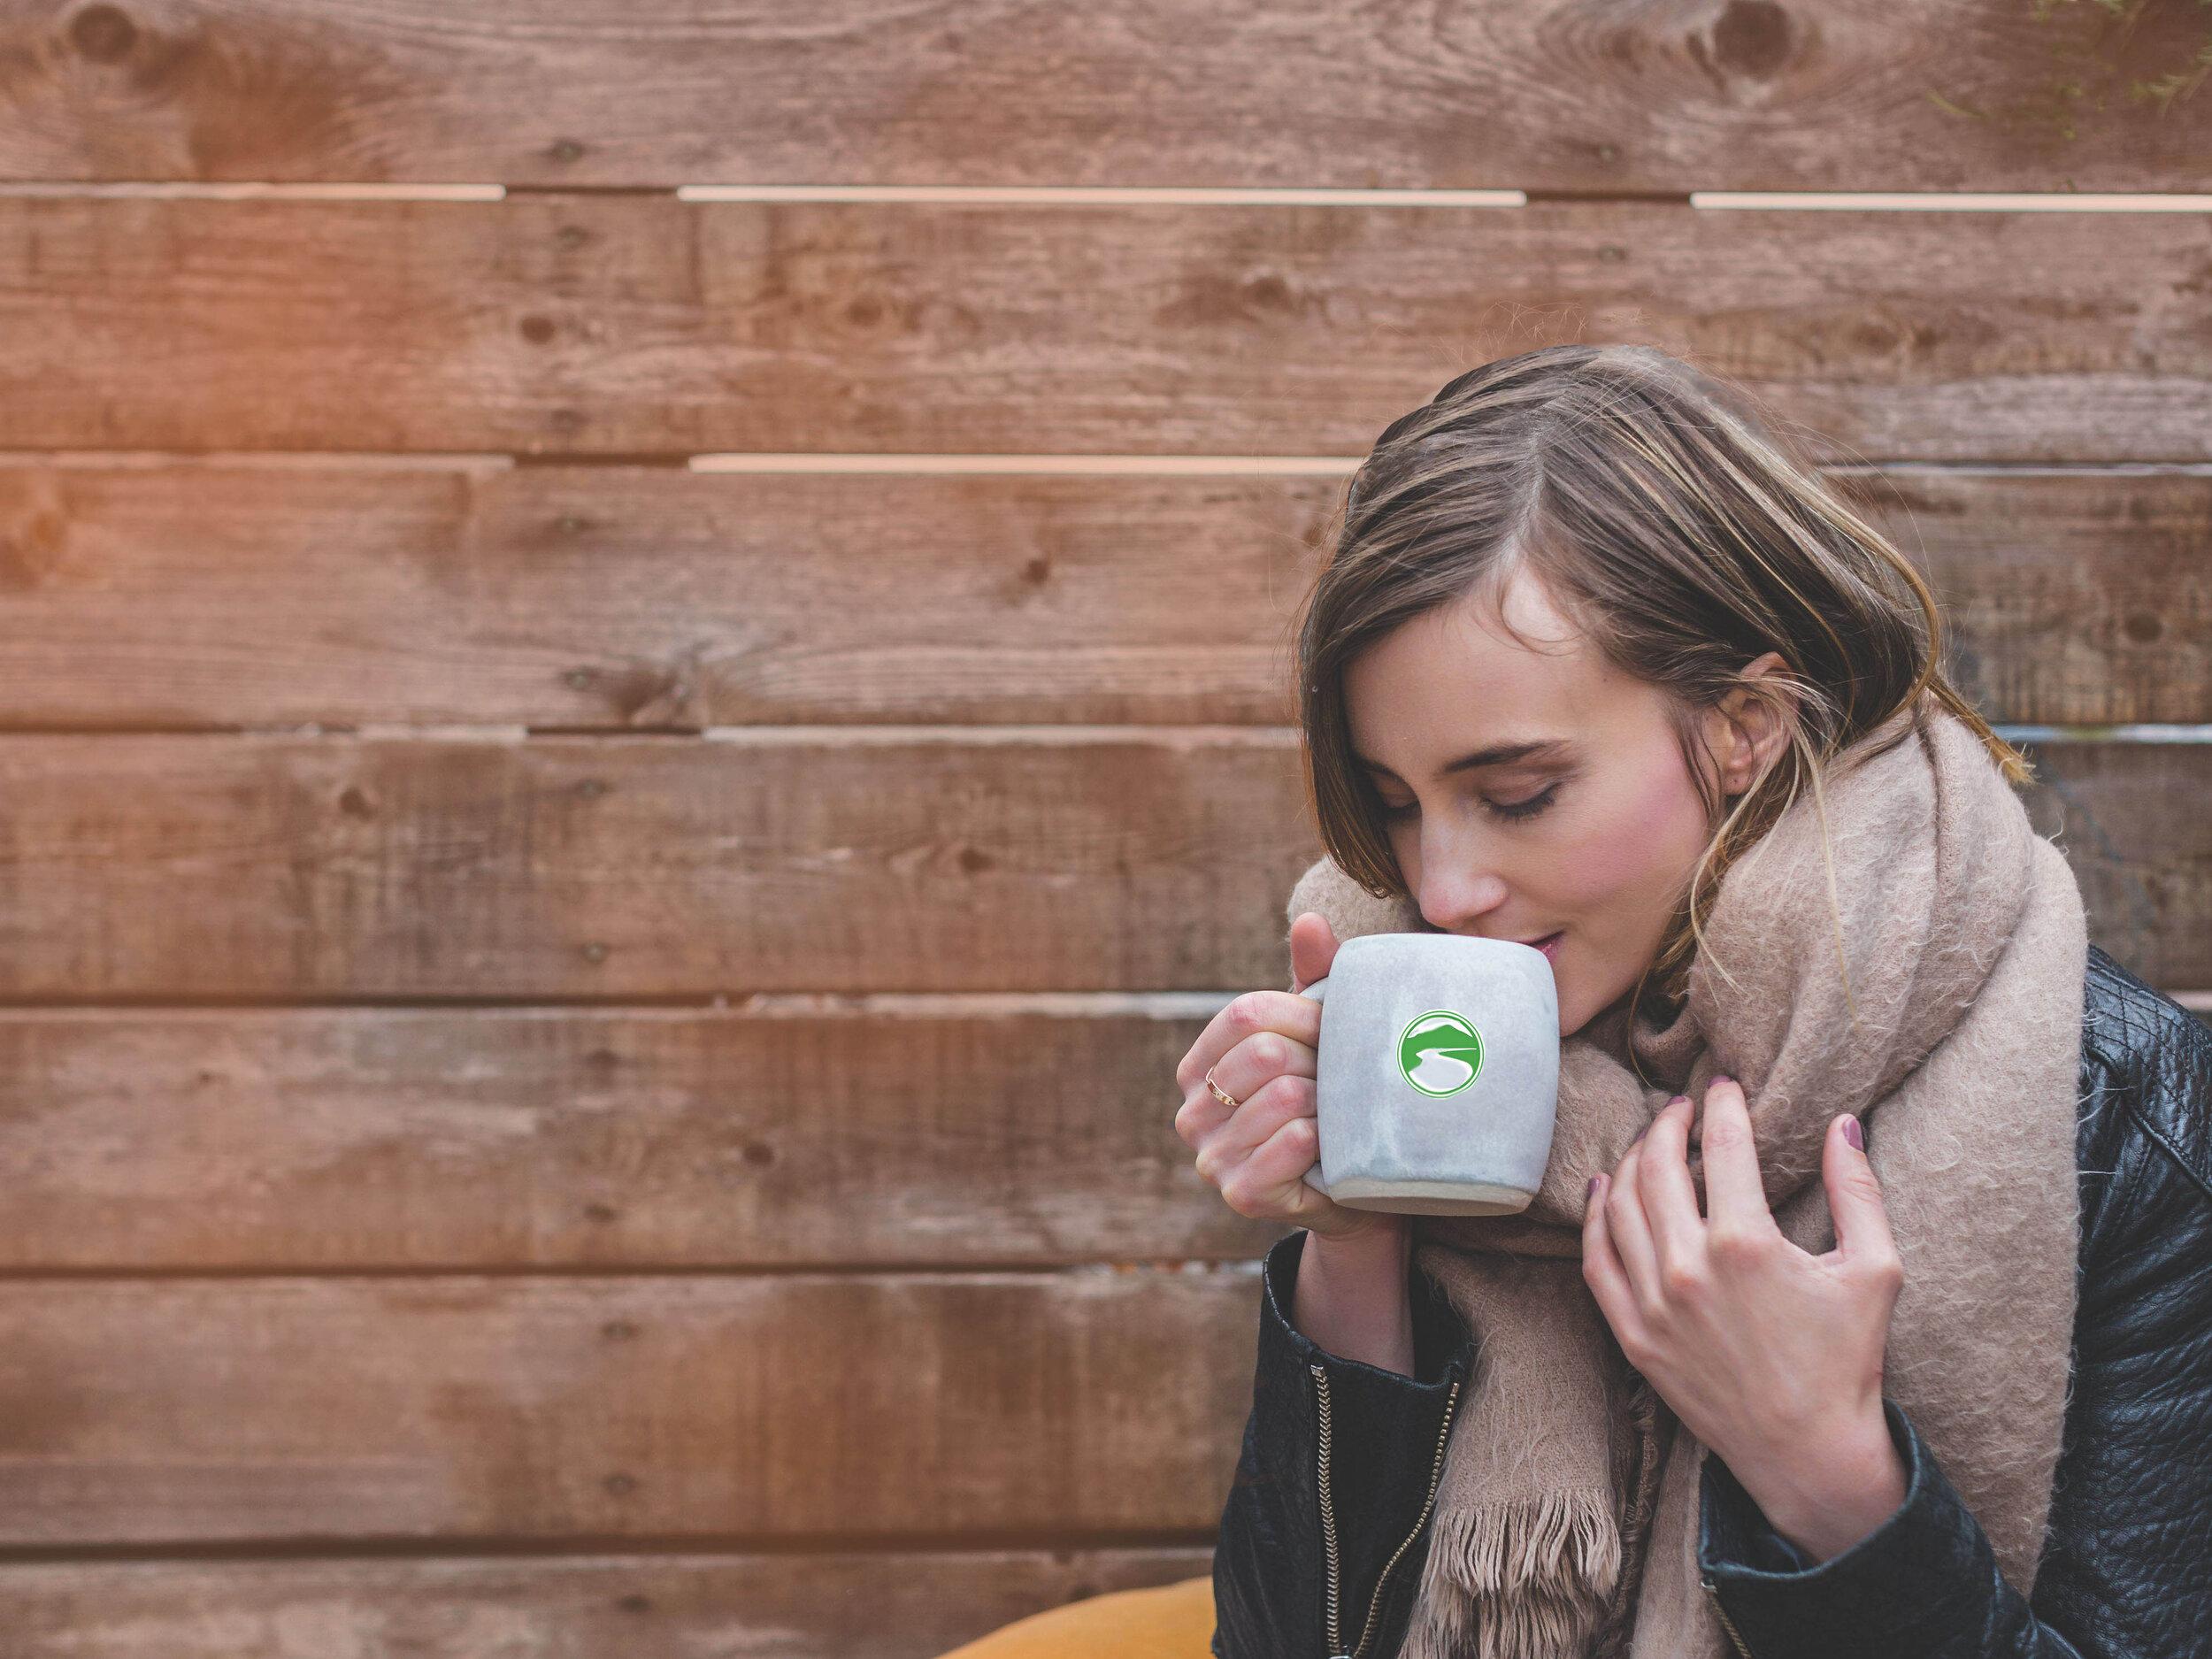 4x3 woman-sipping-coffee_4460x4460.jpg